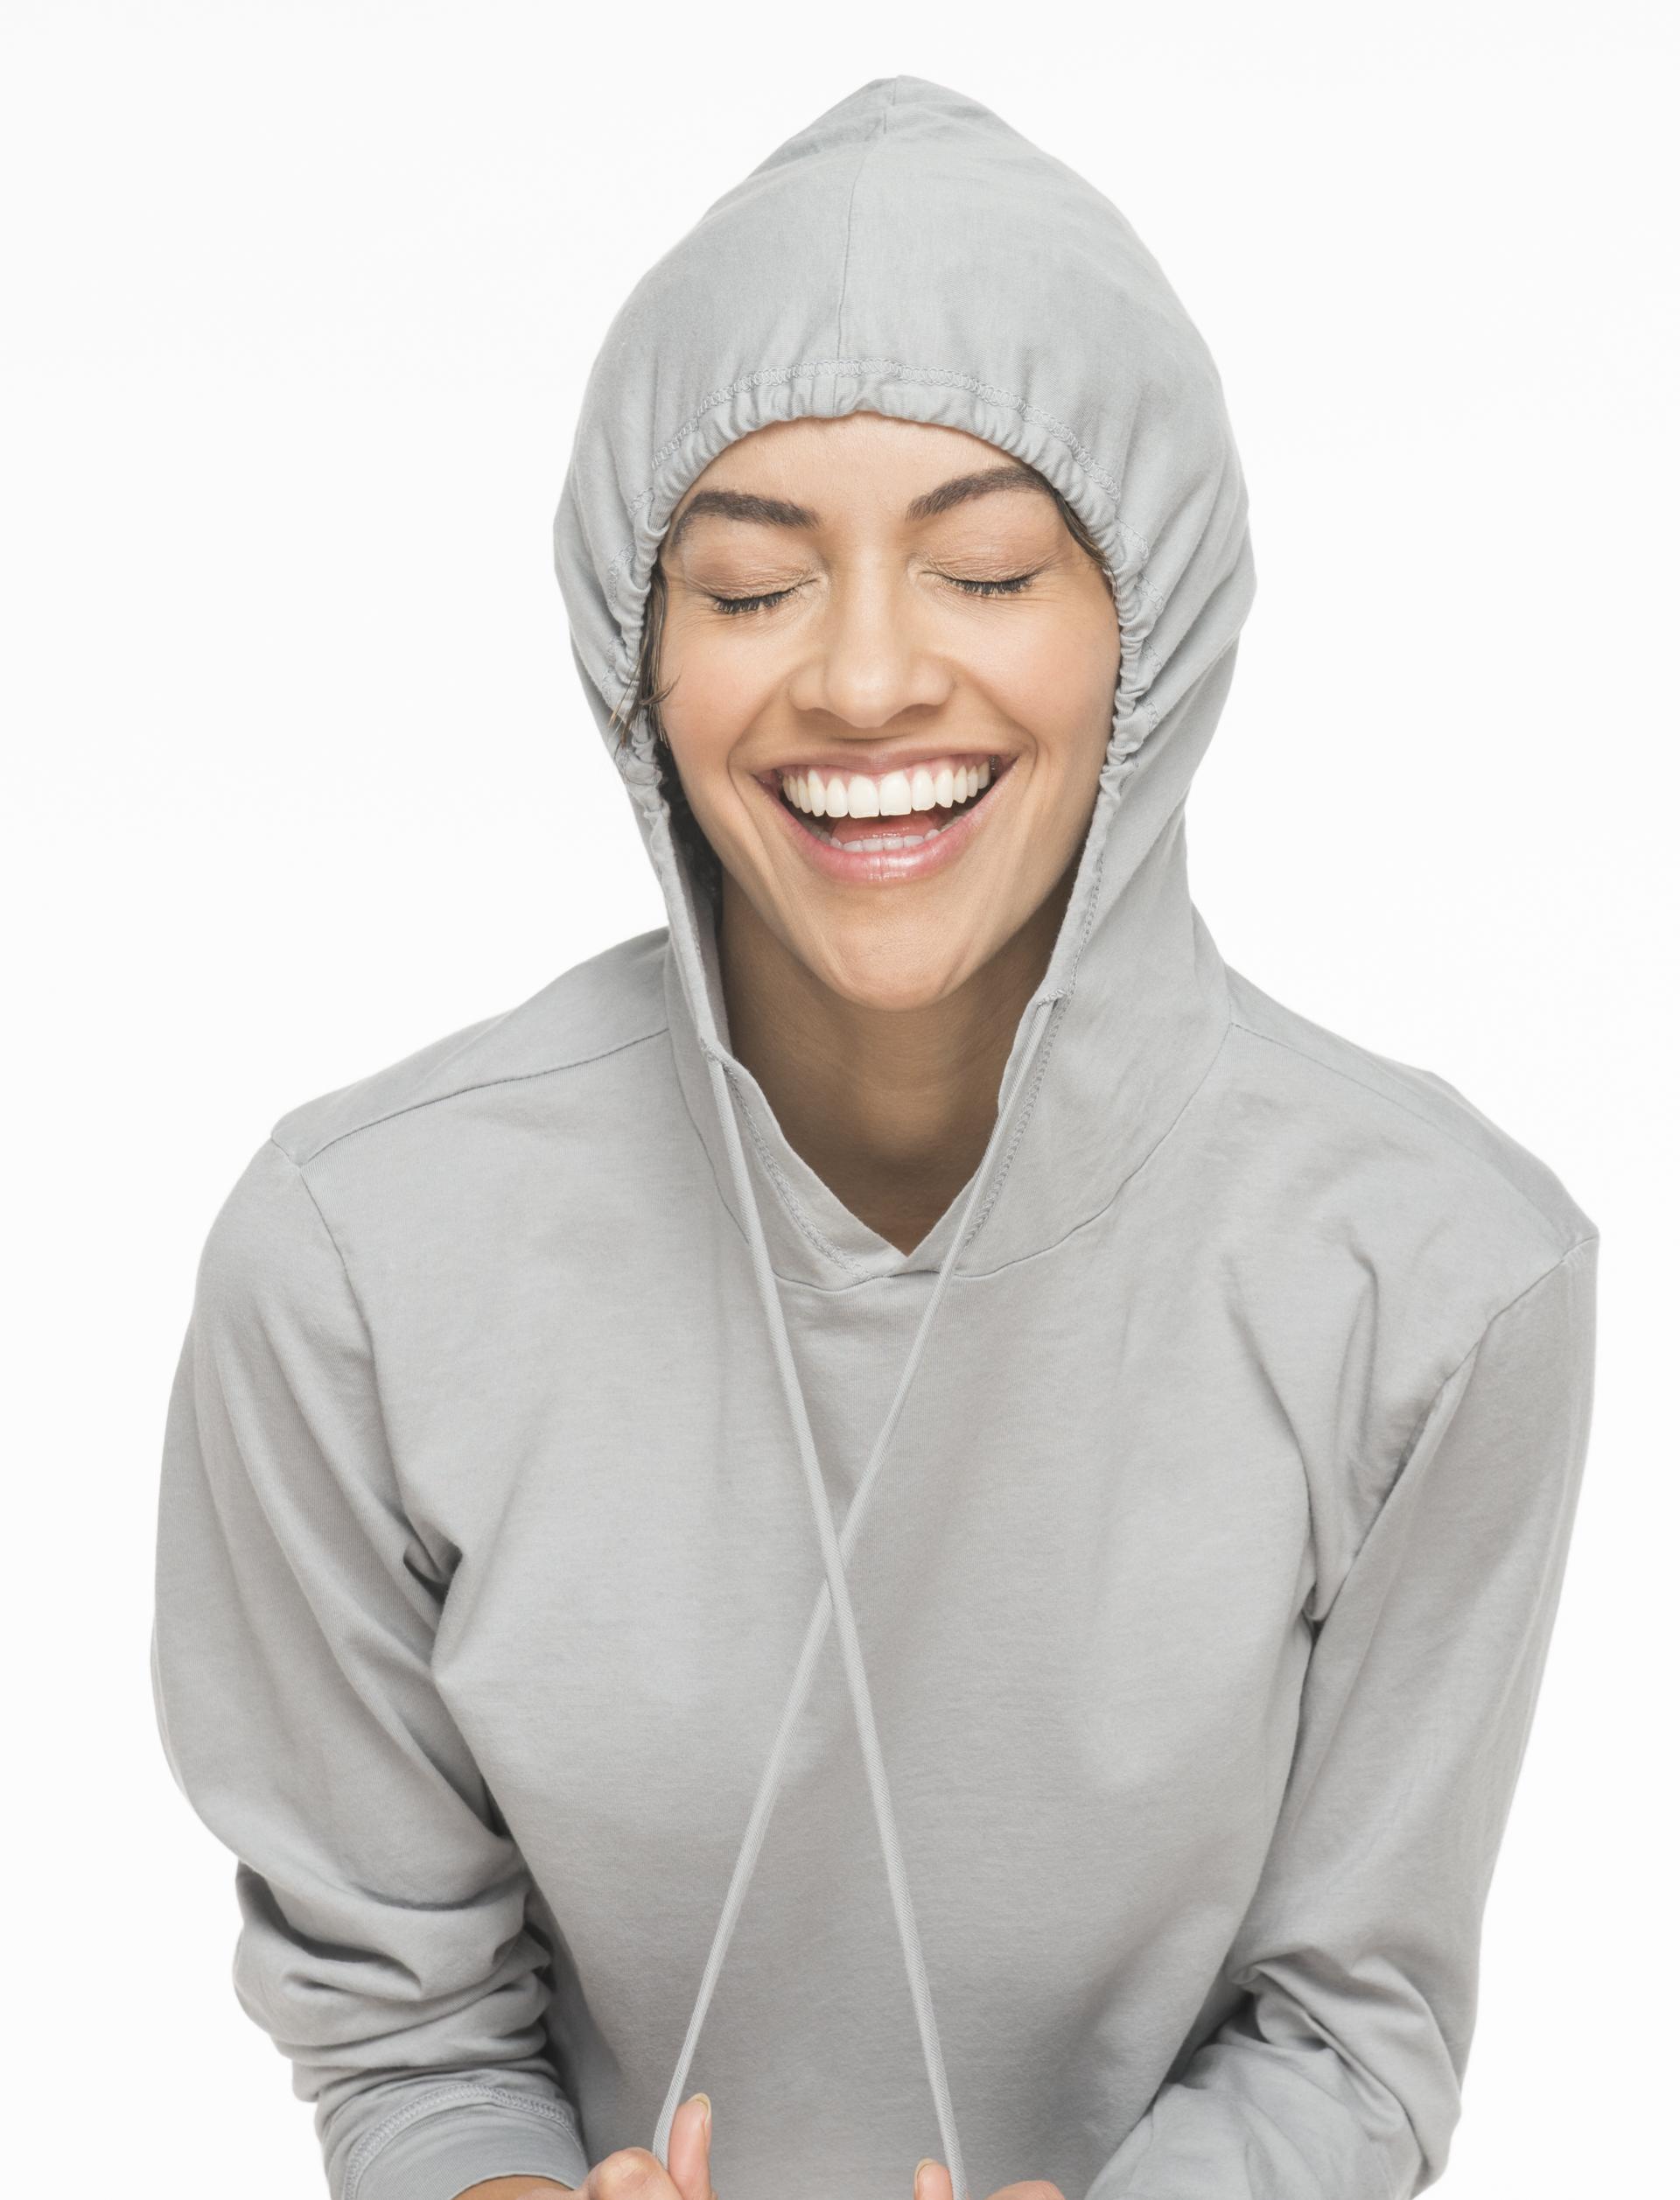 Laughing girl with closed eyes, wearing hoodie.